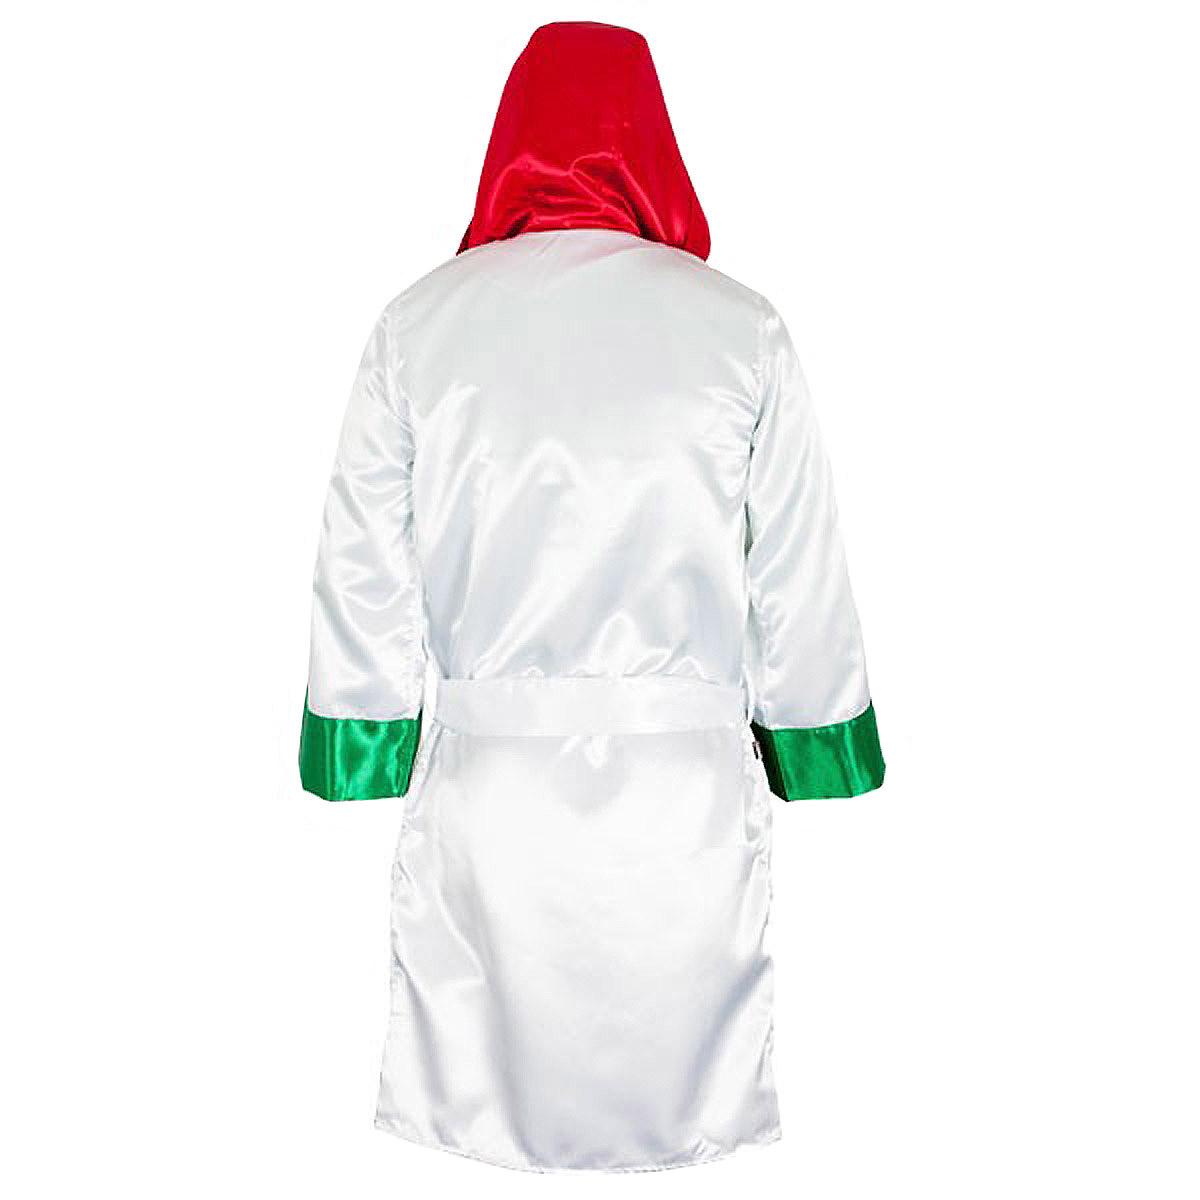 CLETO REYES Satin Boxing Robe with Hood White Medium